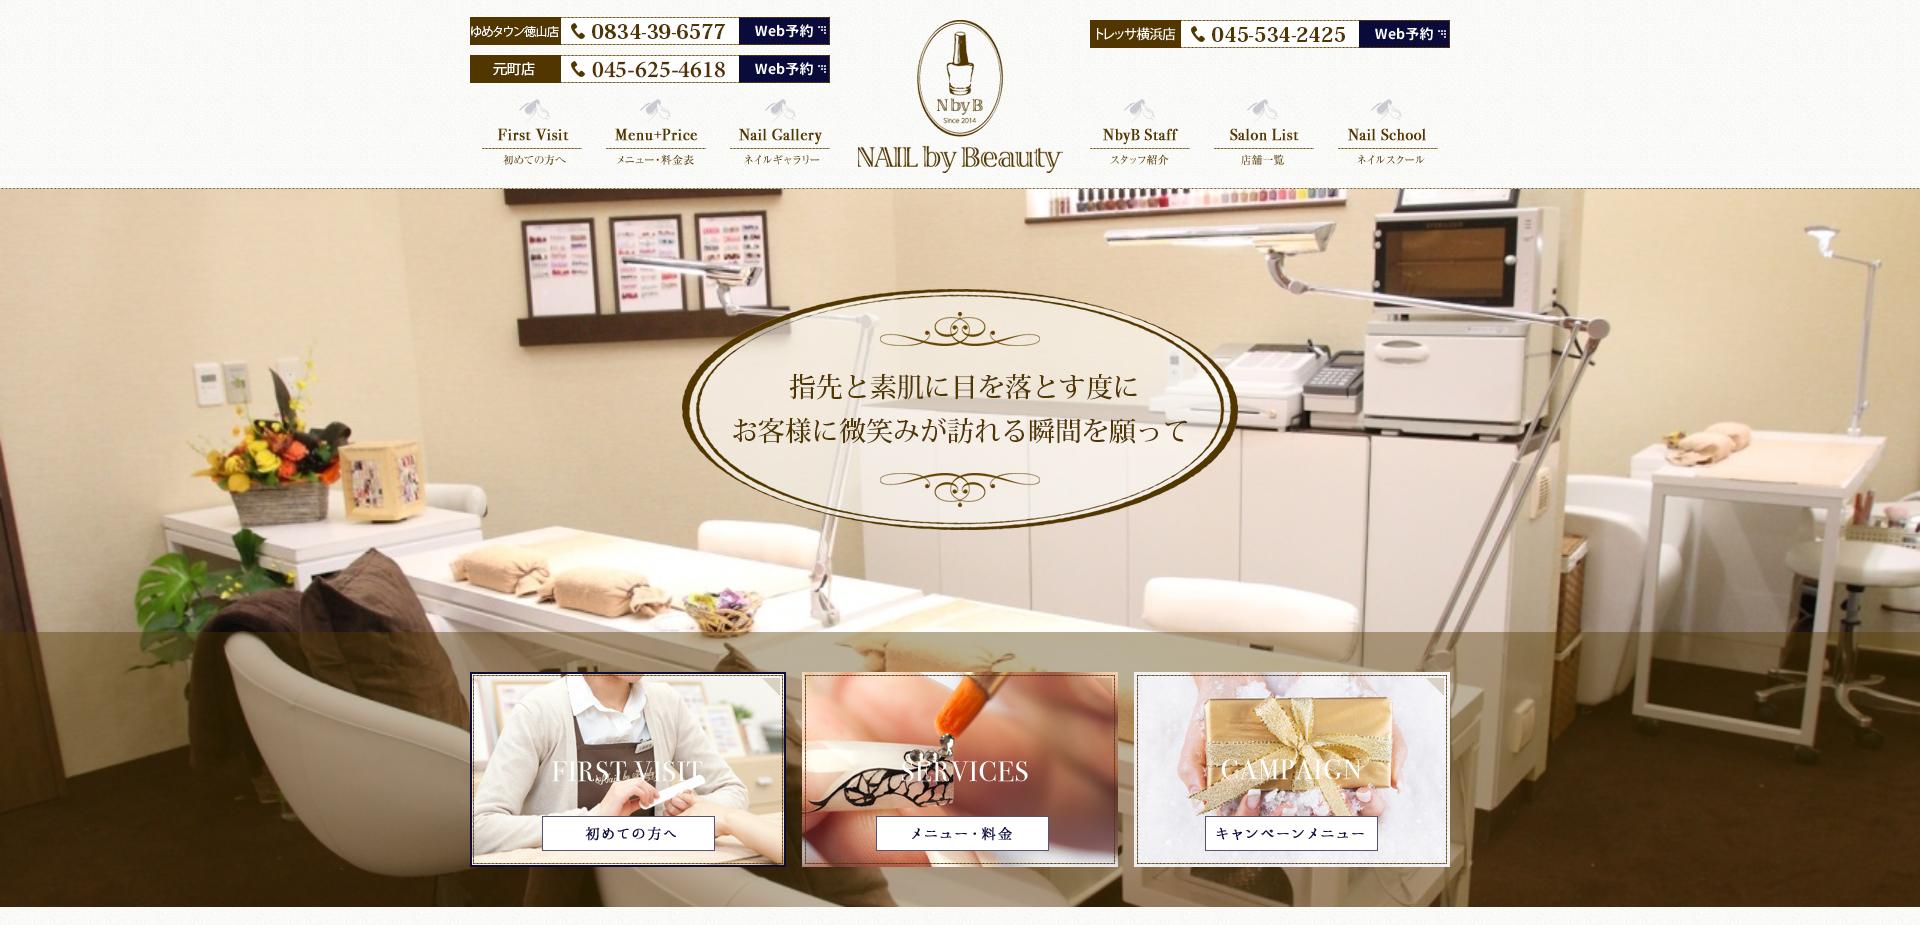 NAIL by Beauty School[ネイルバイビューティースクール]